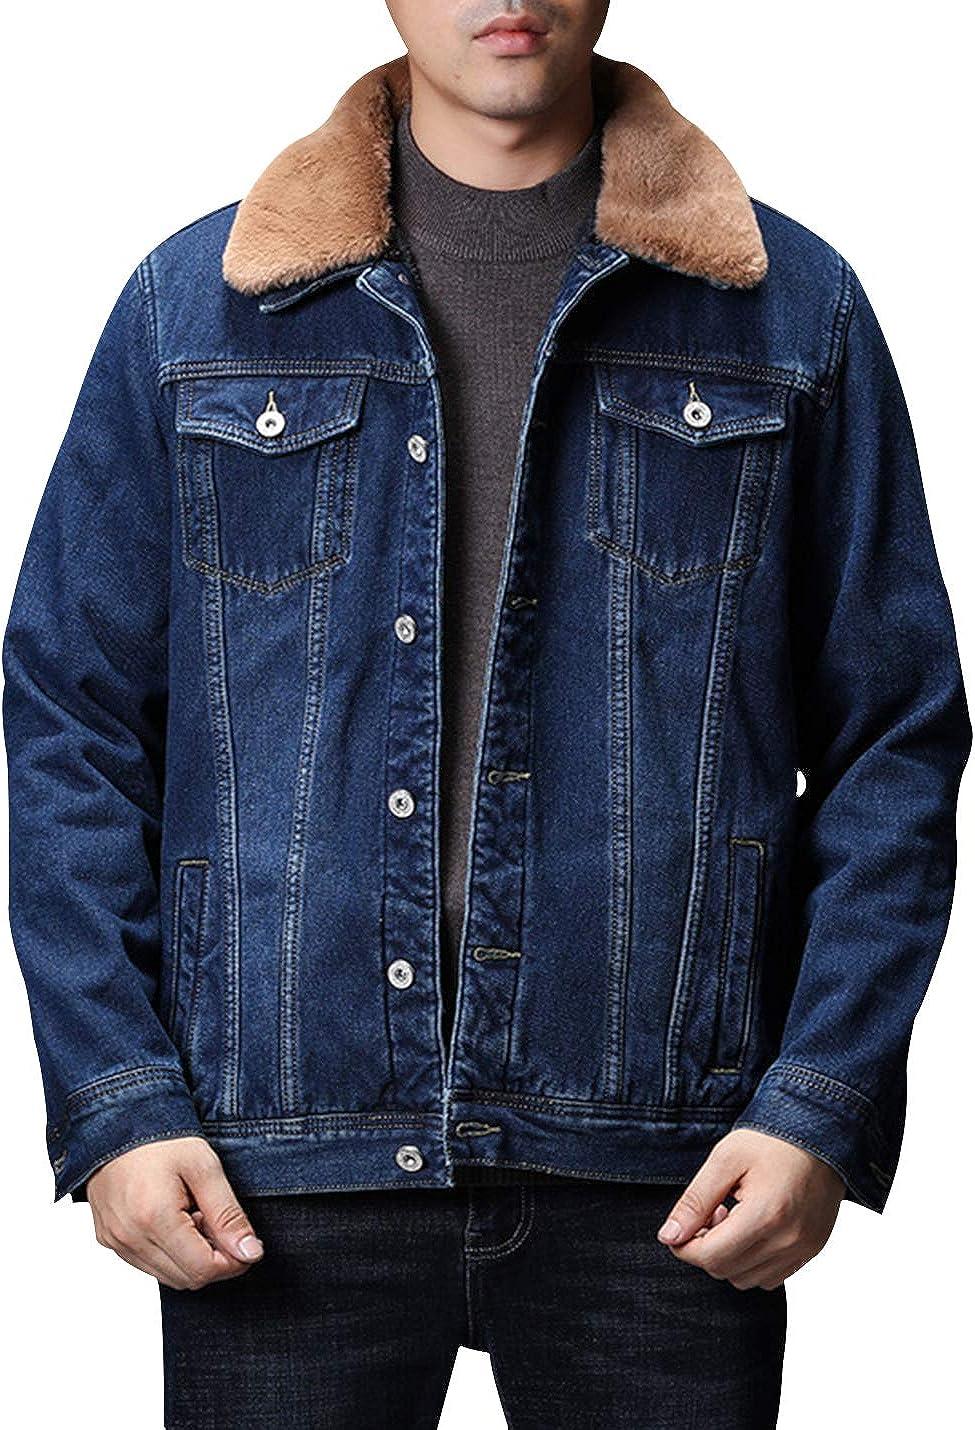 Gihuo Men's Thick Fleece Lined Button Down Jean Denim Jacket